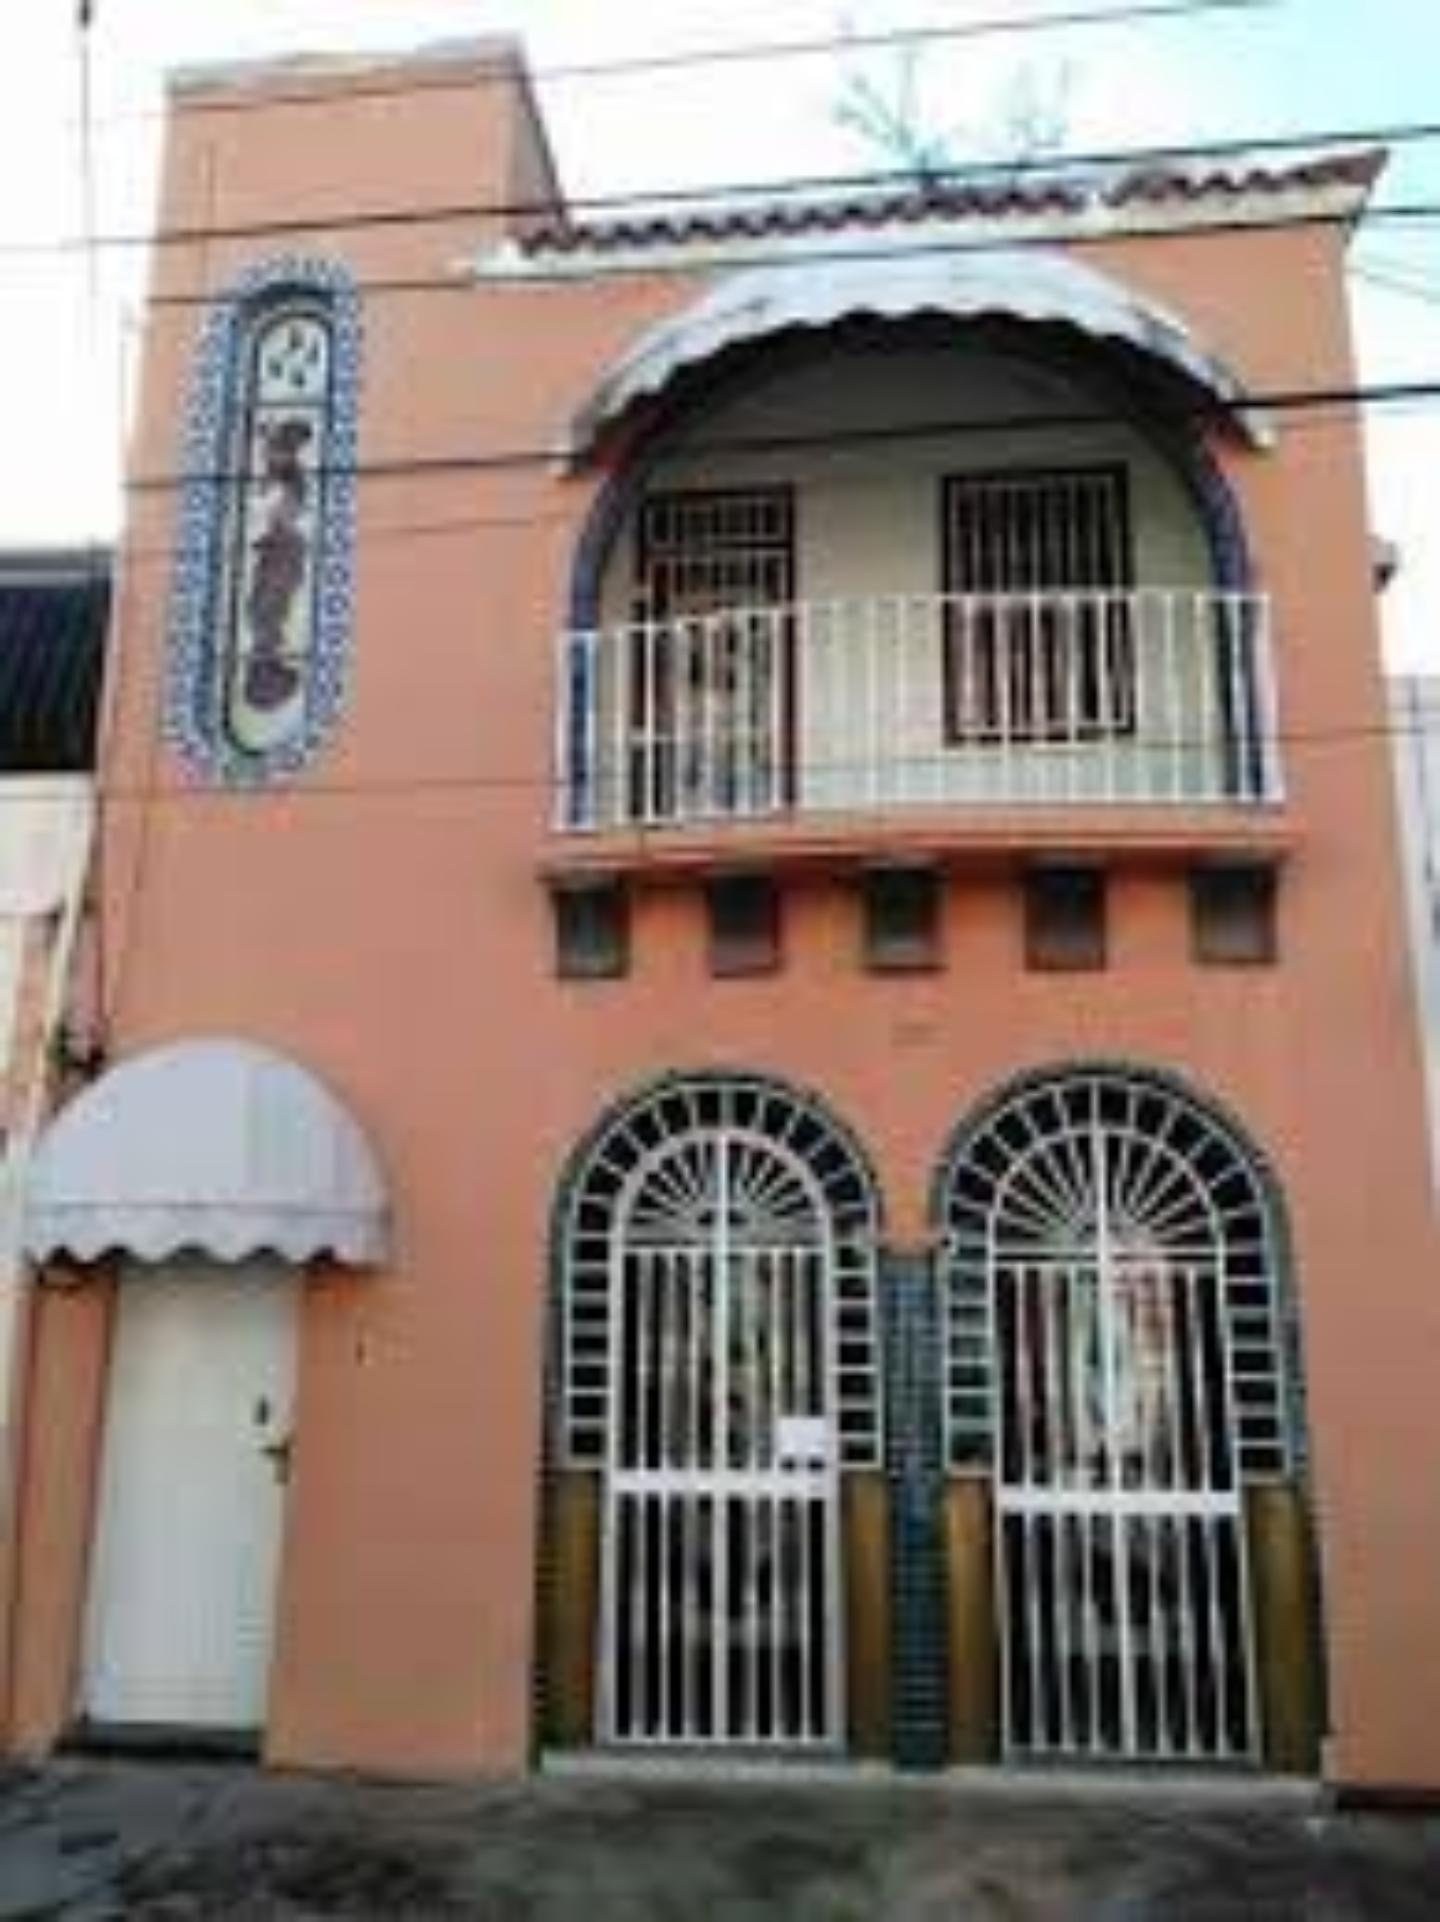 A building next to a window at Casa Florian.